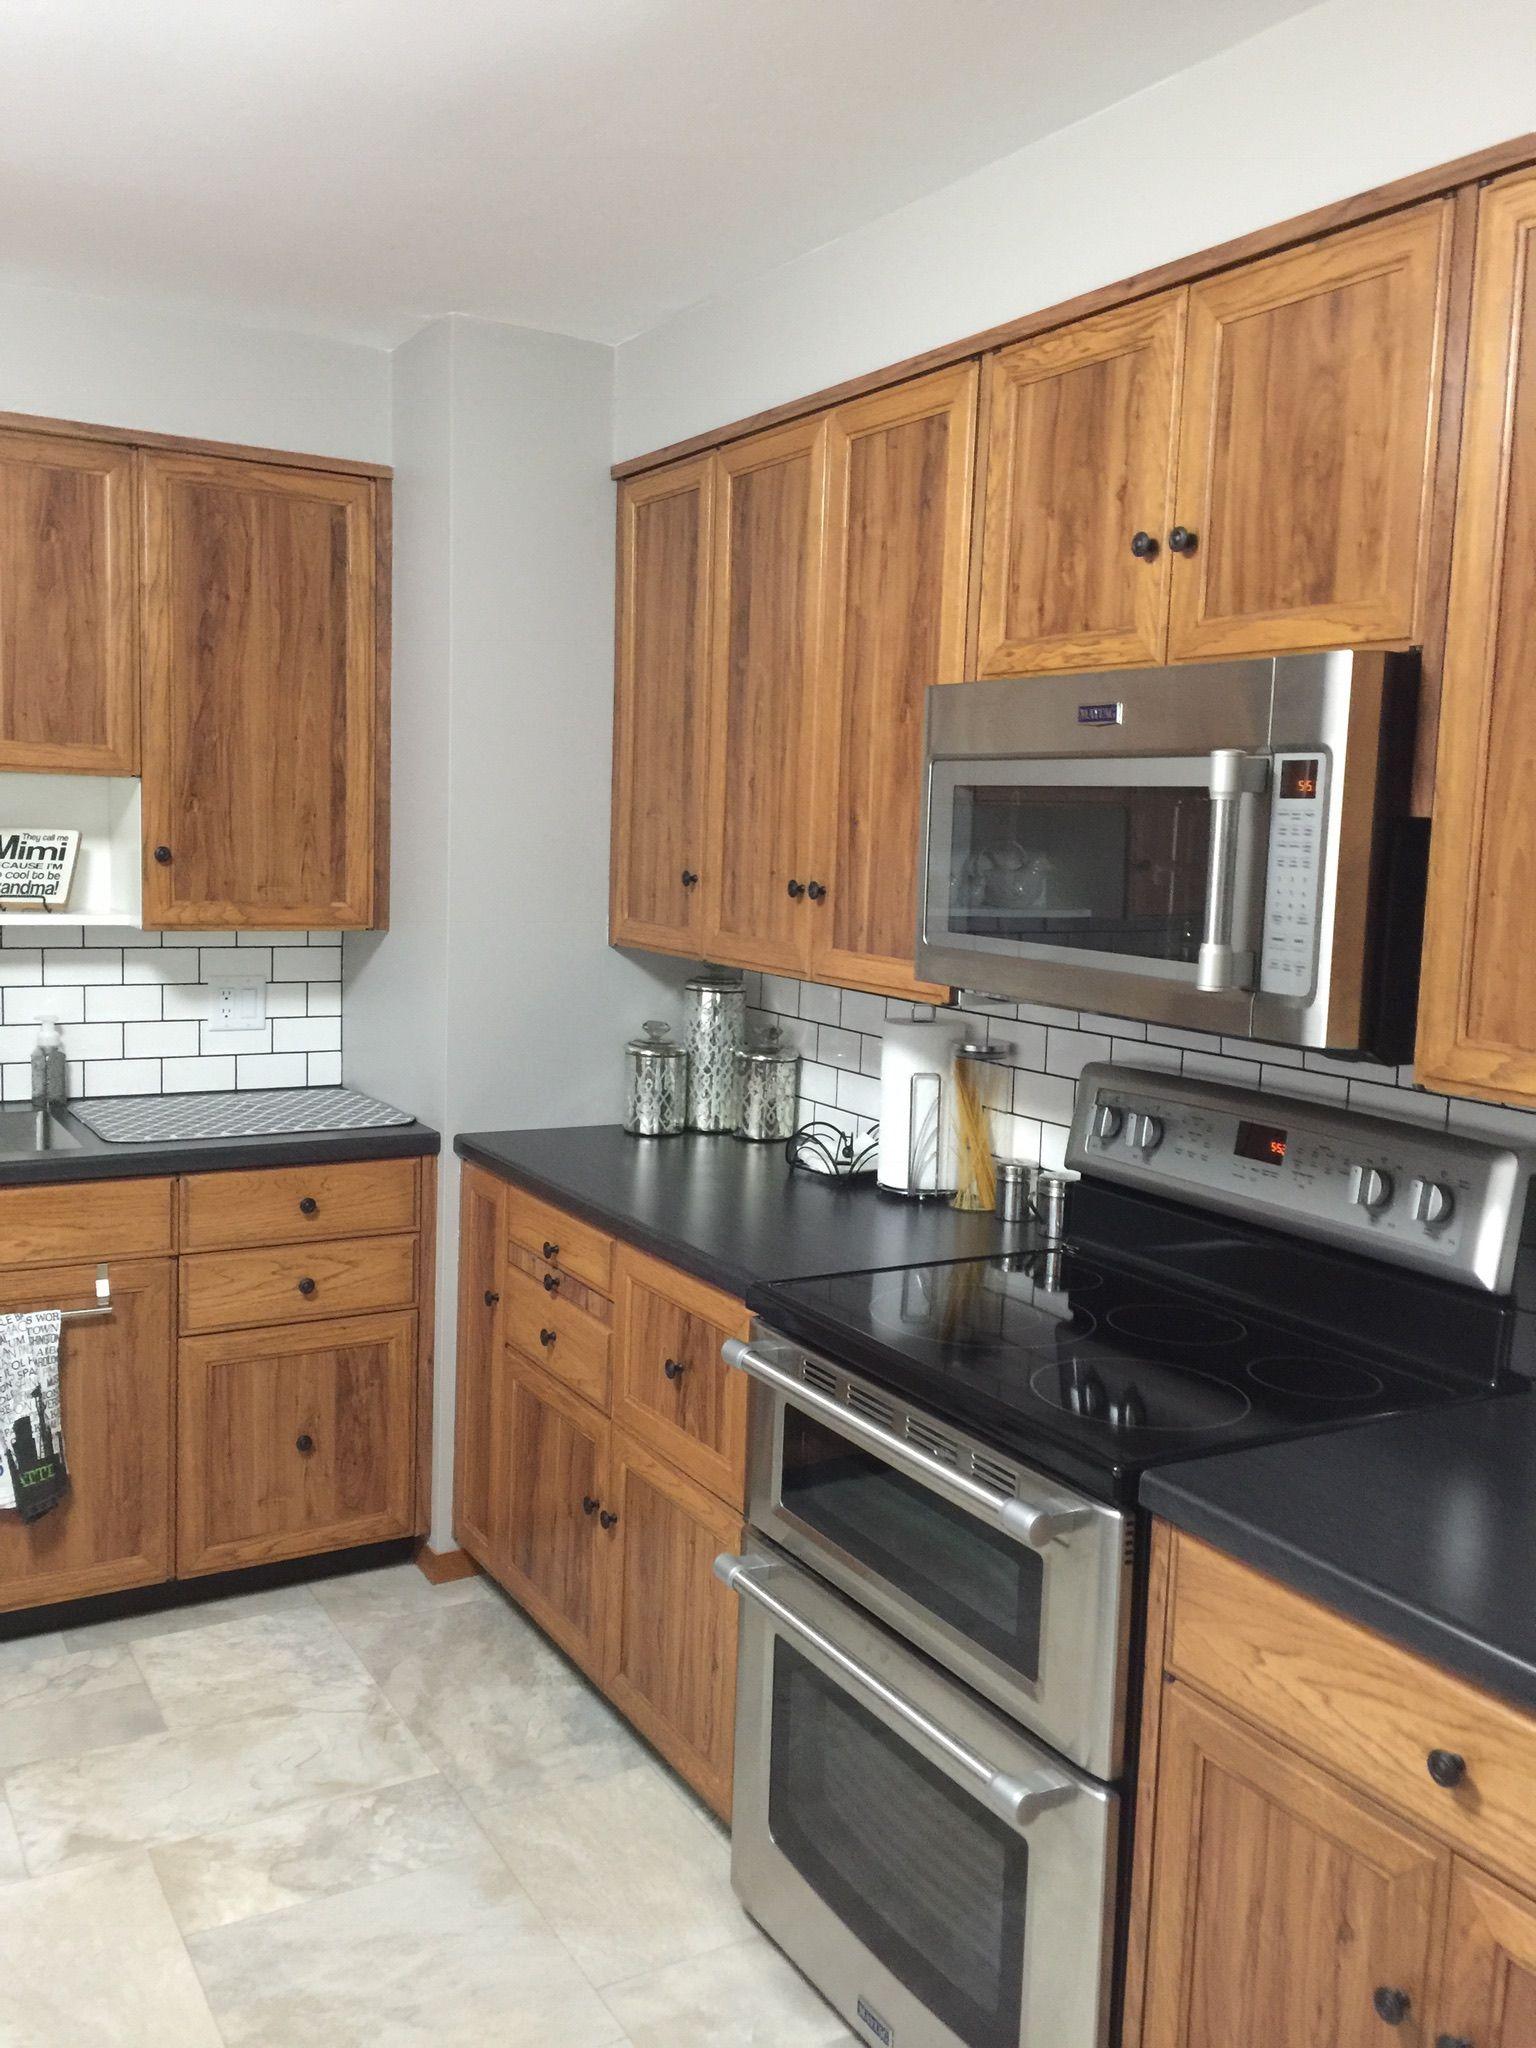 My St Charles kitchen cabinets! | Kitchen cabinets ...